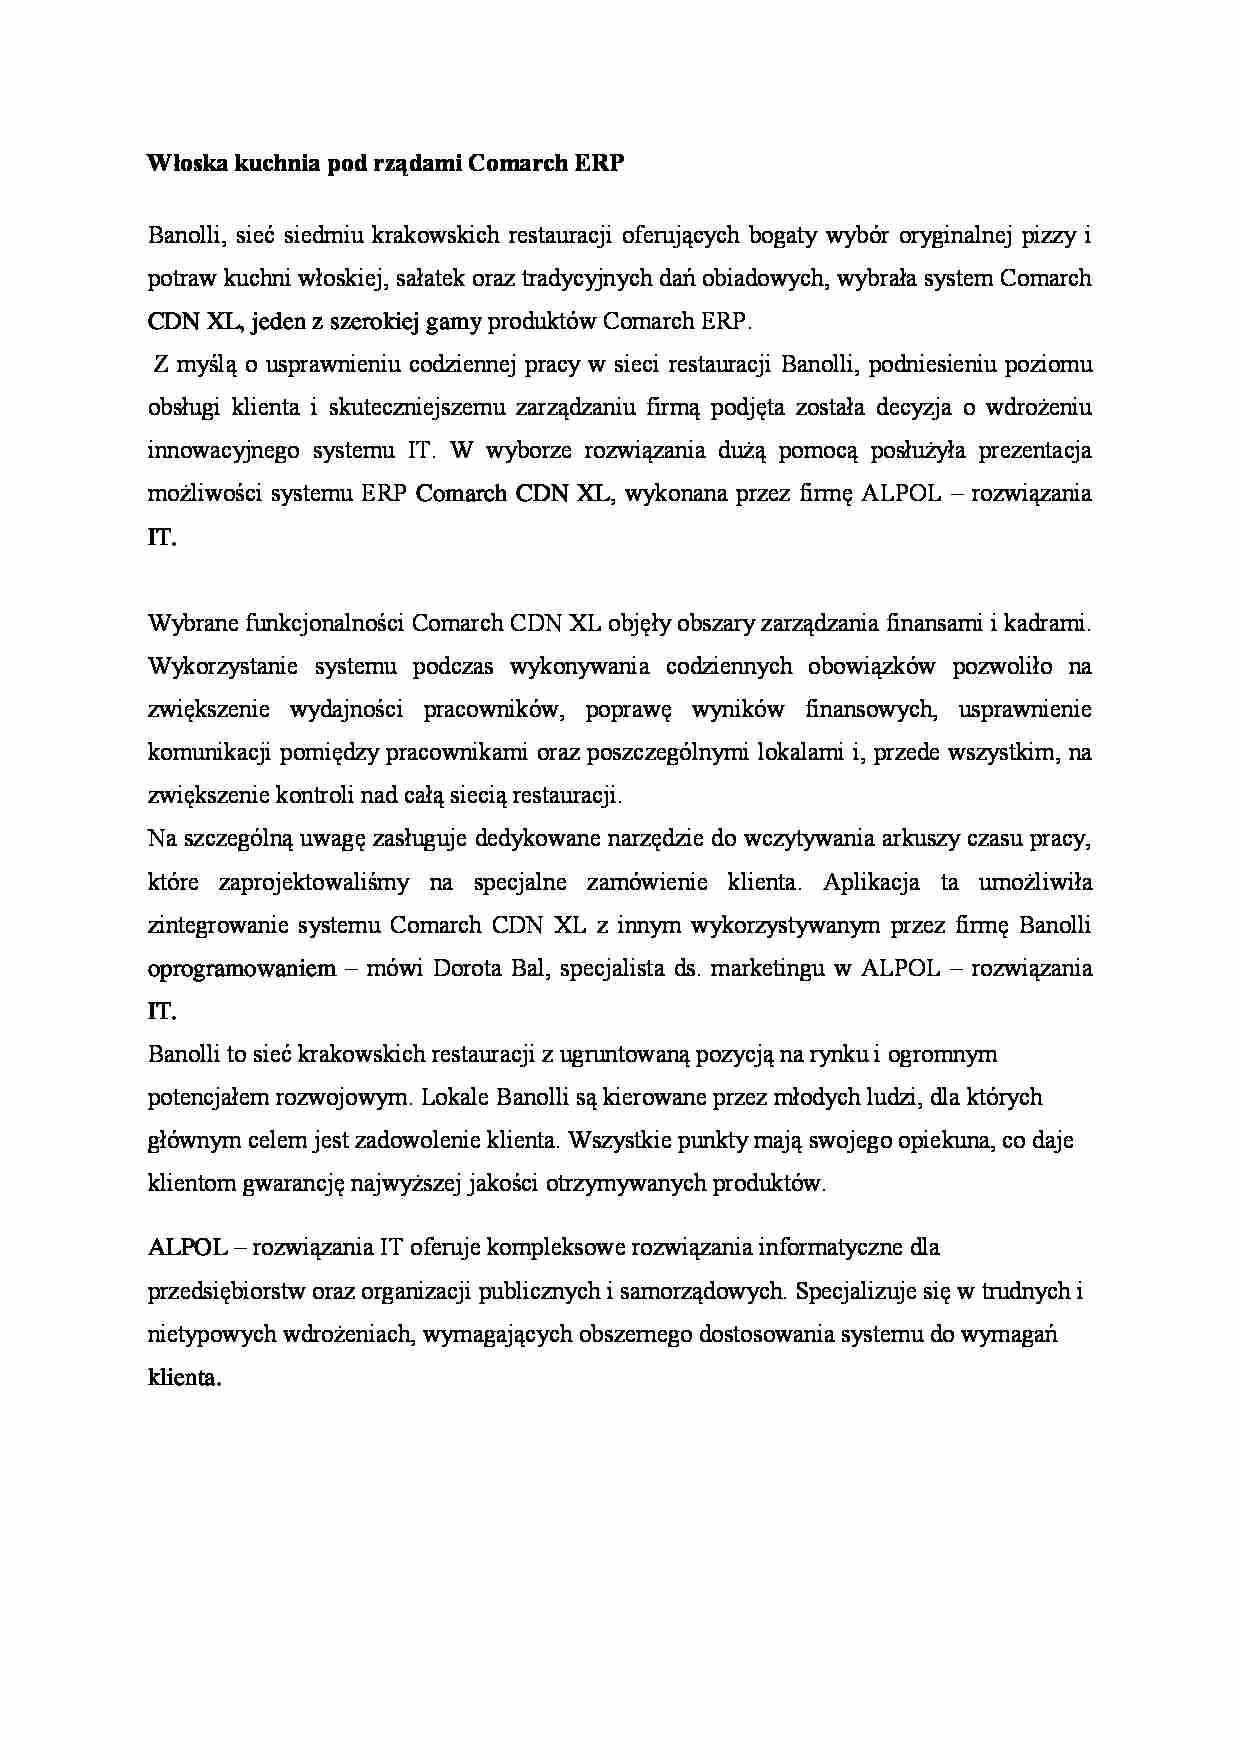 Wloska Kuchnia Pod Rzadami Comarch Erp Referat Notatek Pl